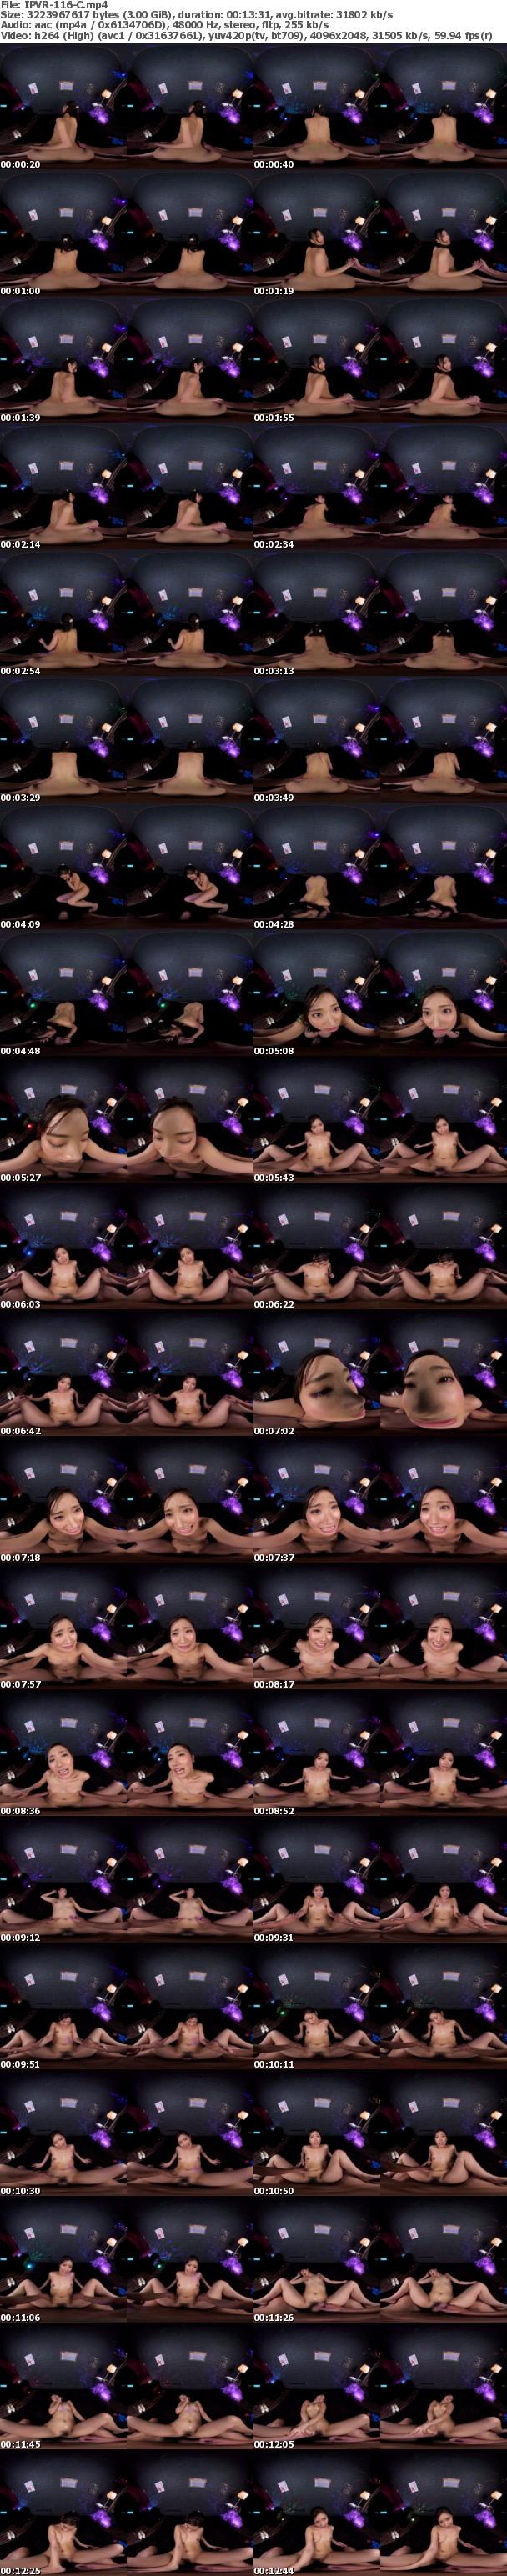 (VR) IPVR-116 「しゃぶるだけでイイの?」アナタのテク次第で本番OK!? 恋人気分にさせてくれる神接客ピンサロ嬢と本番!? VR 加美杏奈